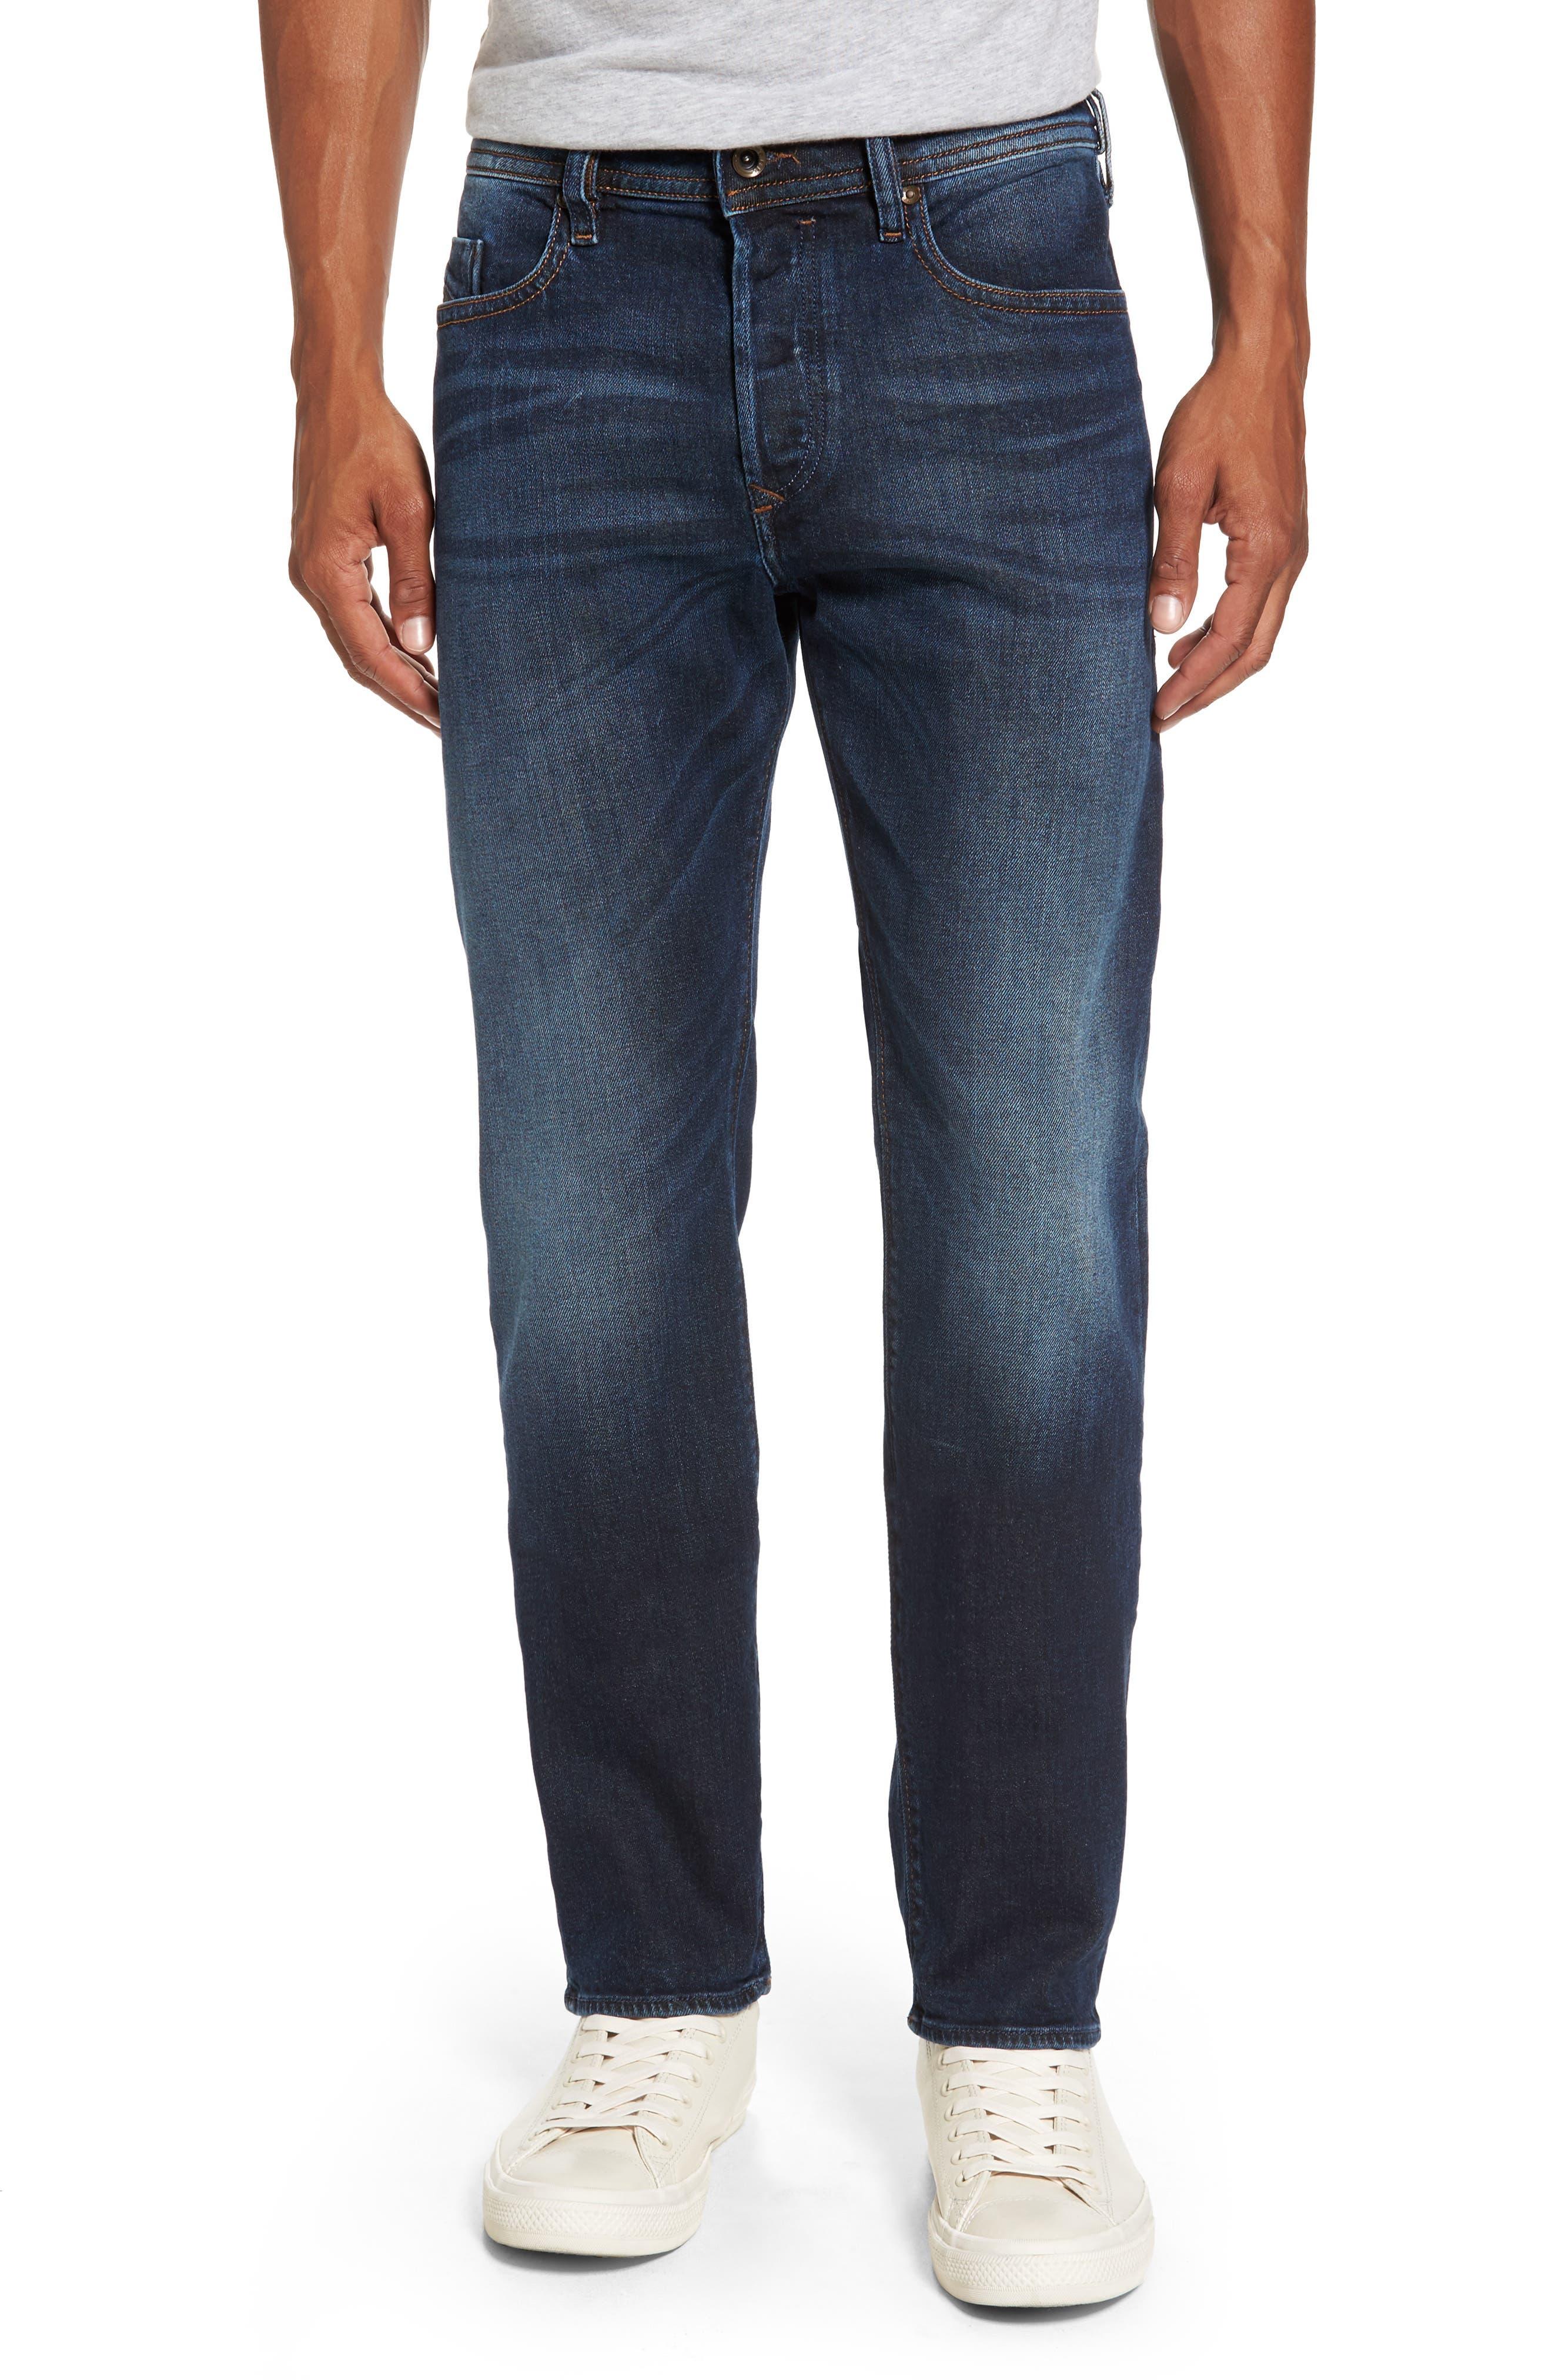 Buster Slim Straight Leg Jeans,                         Main,                         color, Denim